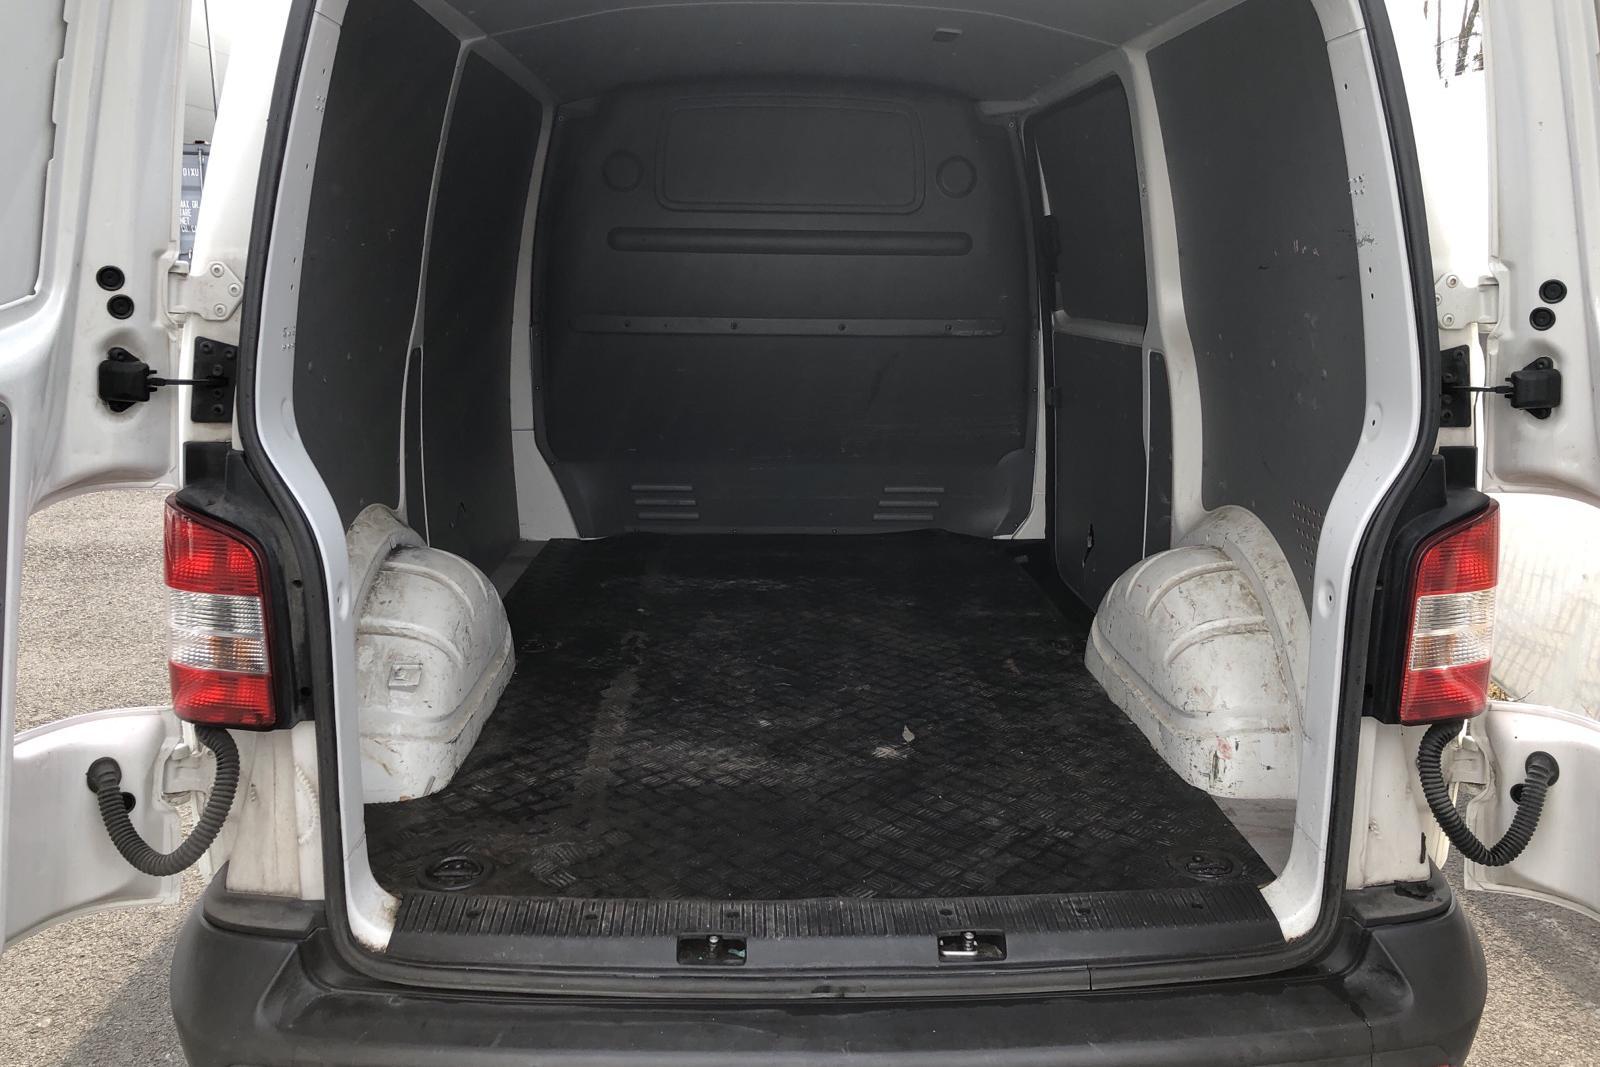 VW Transporter T5 2.0 TDI (140hk) - 259 690 km - Manual - white - 2014